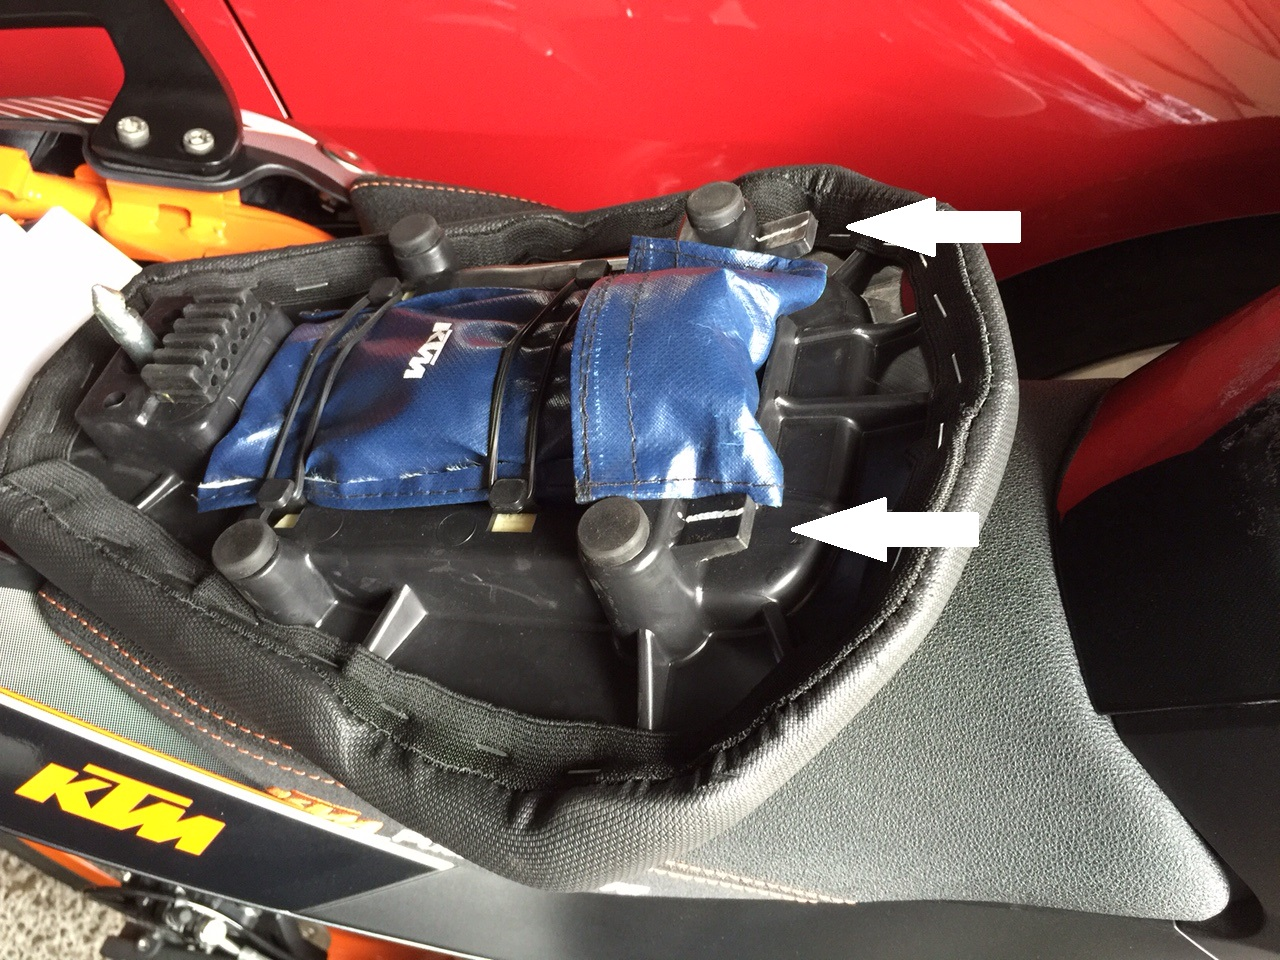 KTM Powerparts Ergo seat install-ktm-passenger-seat-bottom.jpg